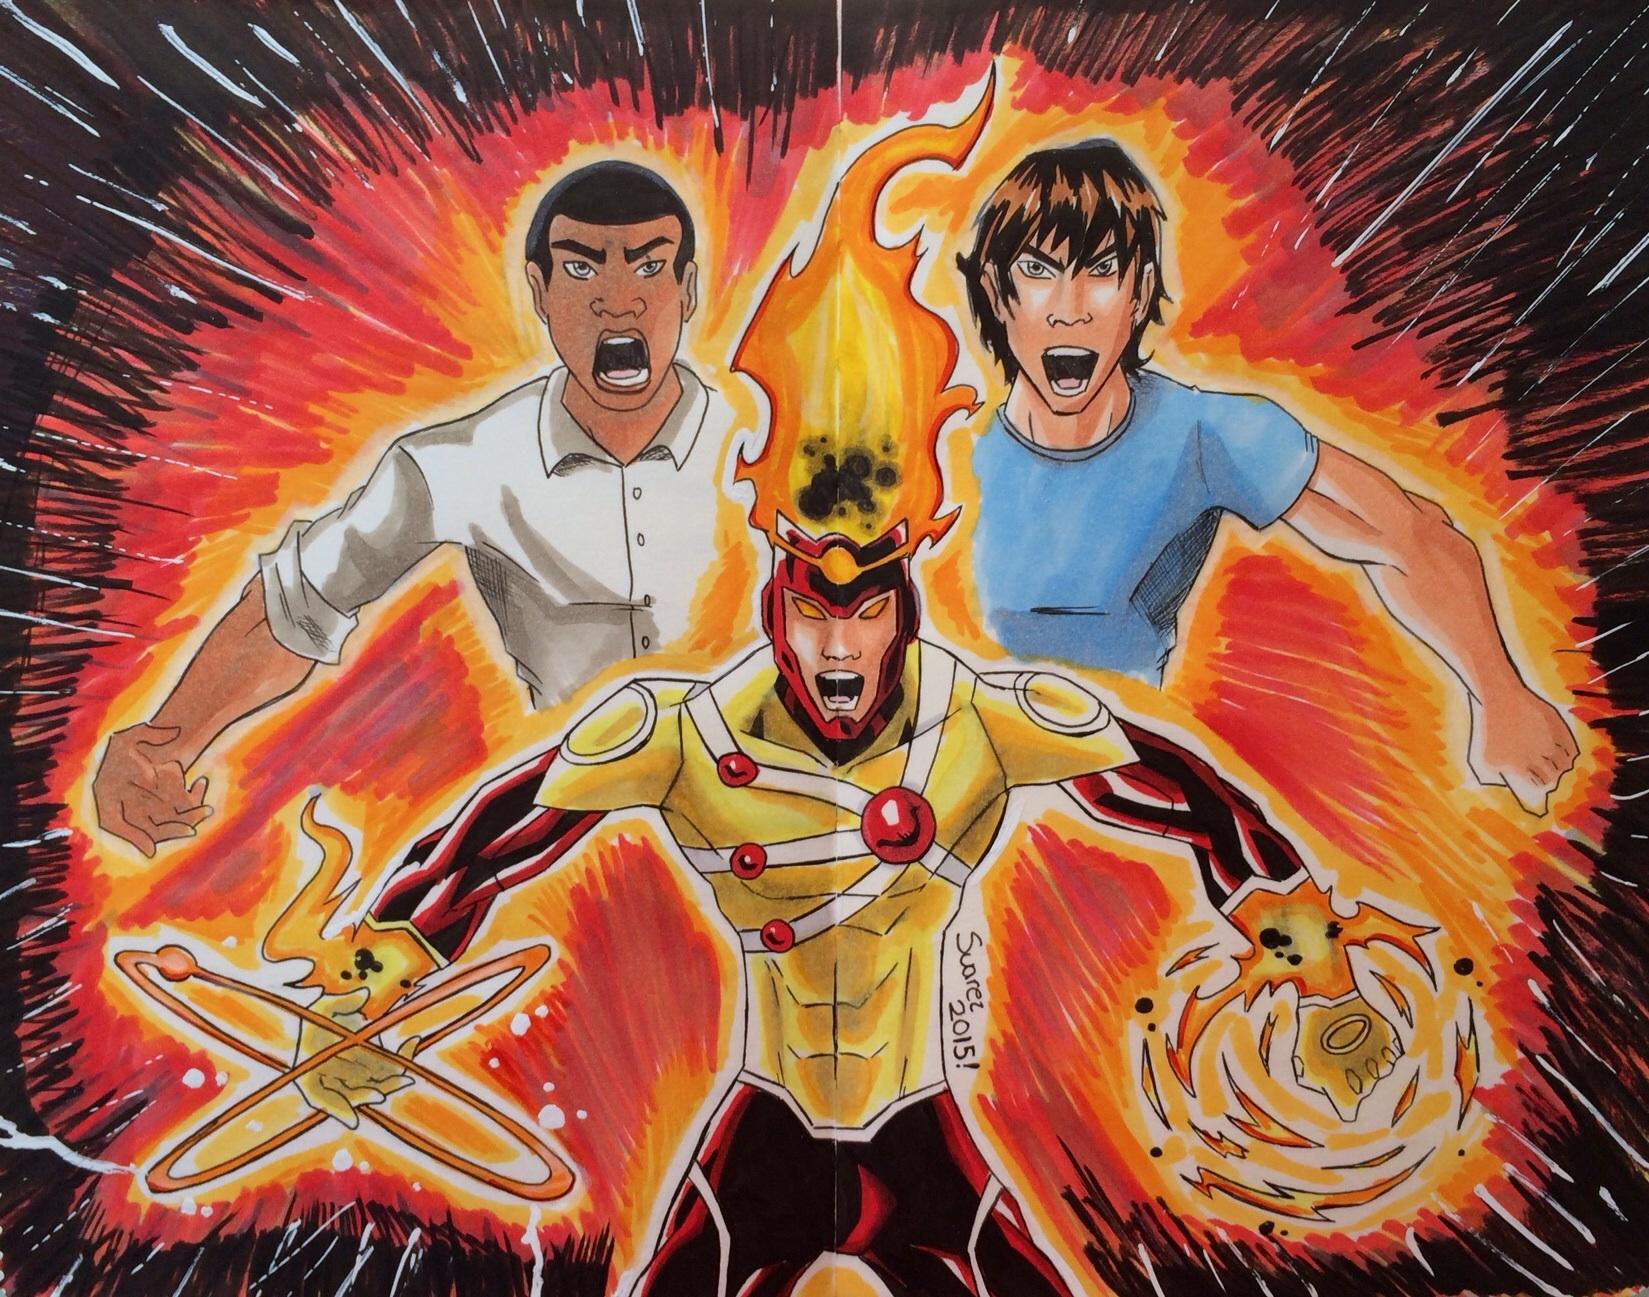 We are Firestorm!